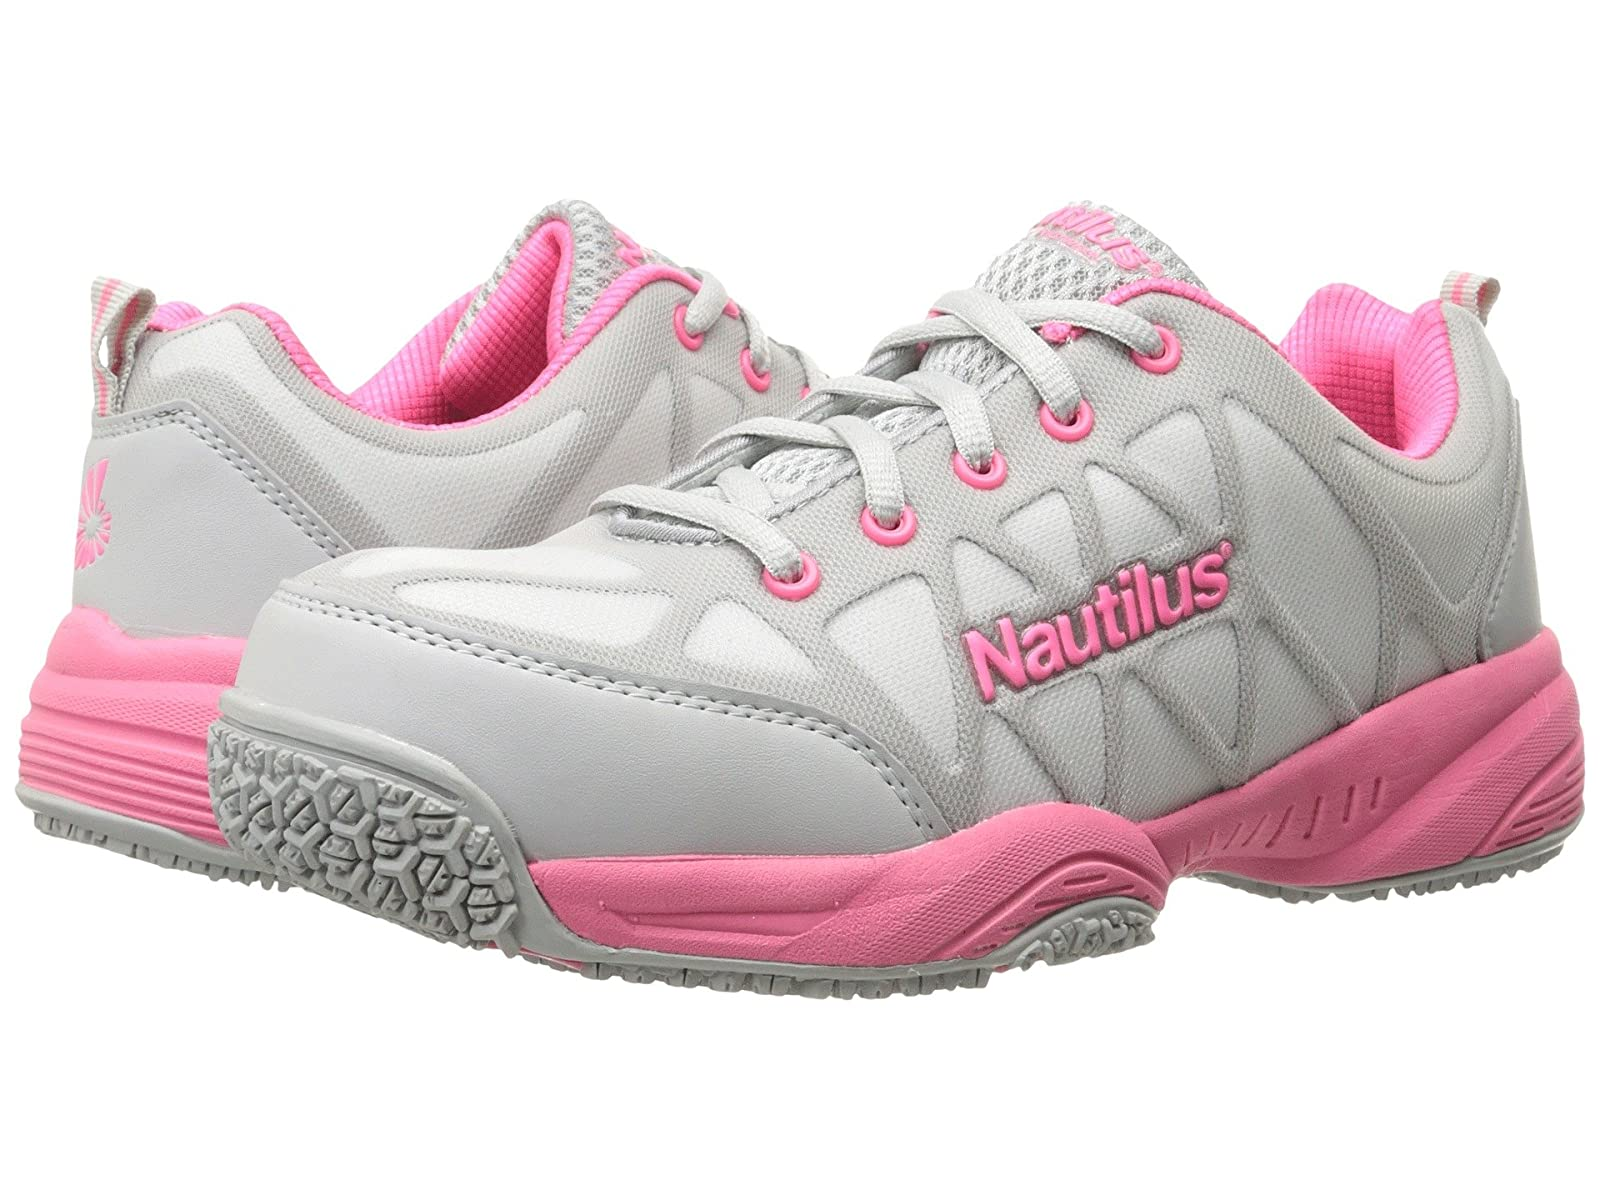 Nautilus N2155 Composite ToeAtmospheric grades have affordable shoes